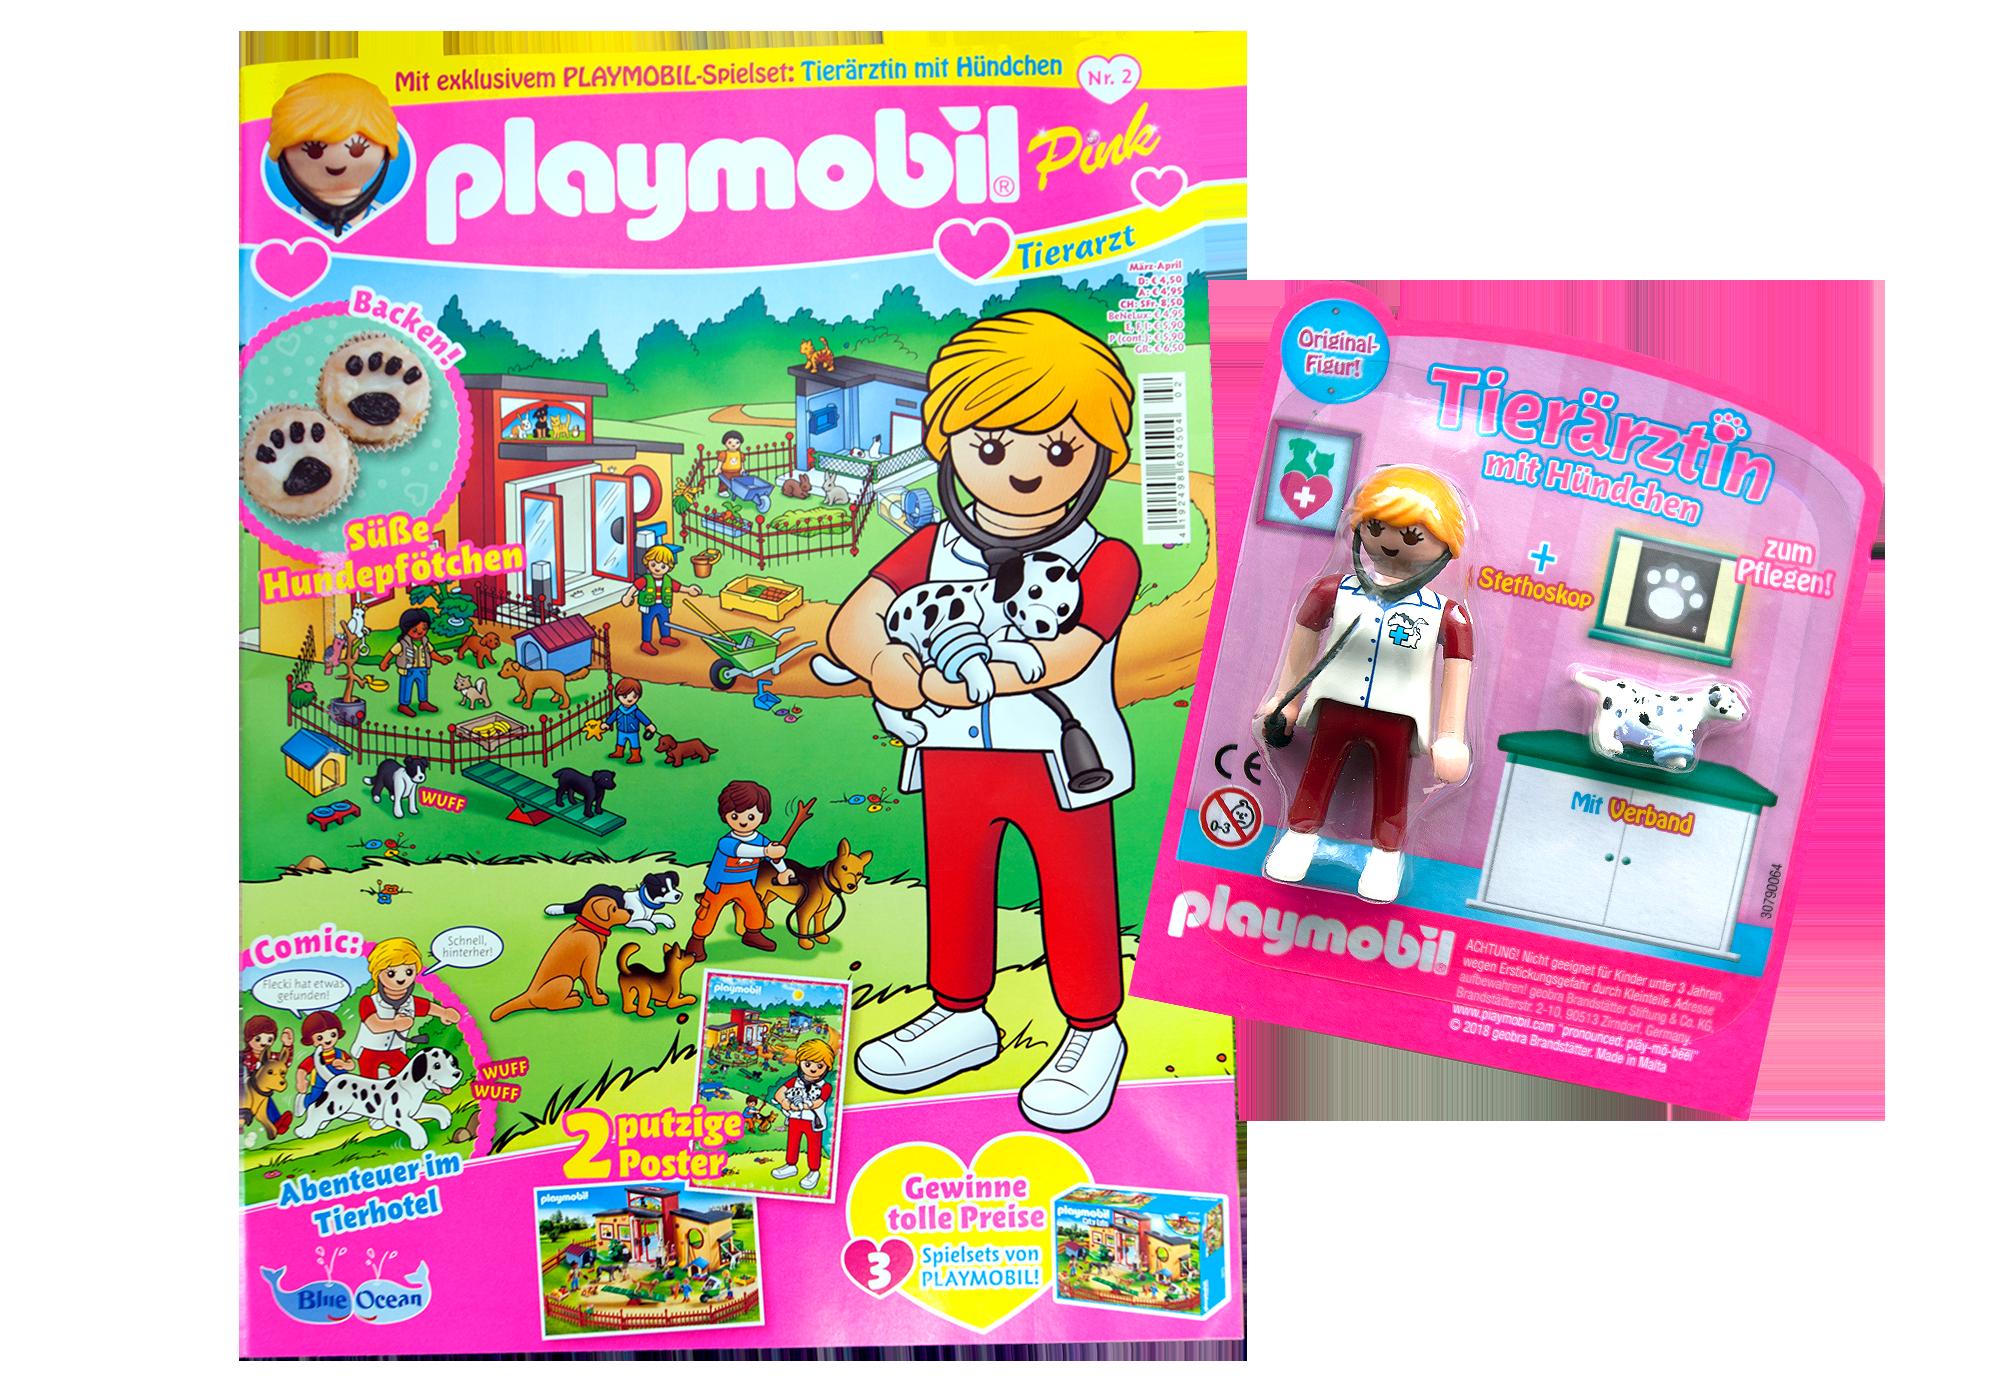 http://media.playmobil.com/i/playmobil/80603_product_detail/PLAYMOBIL-Magazin Pink 2/2018 (Heft 34)